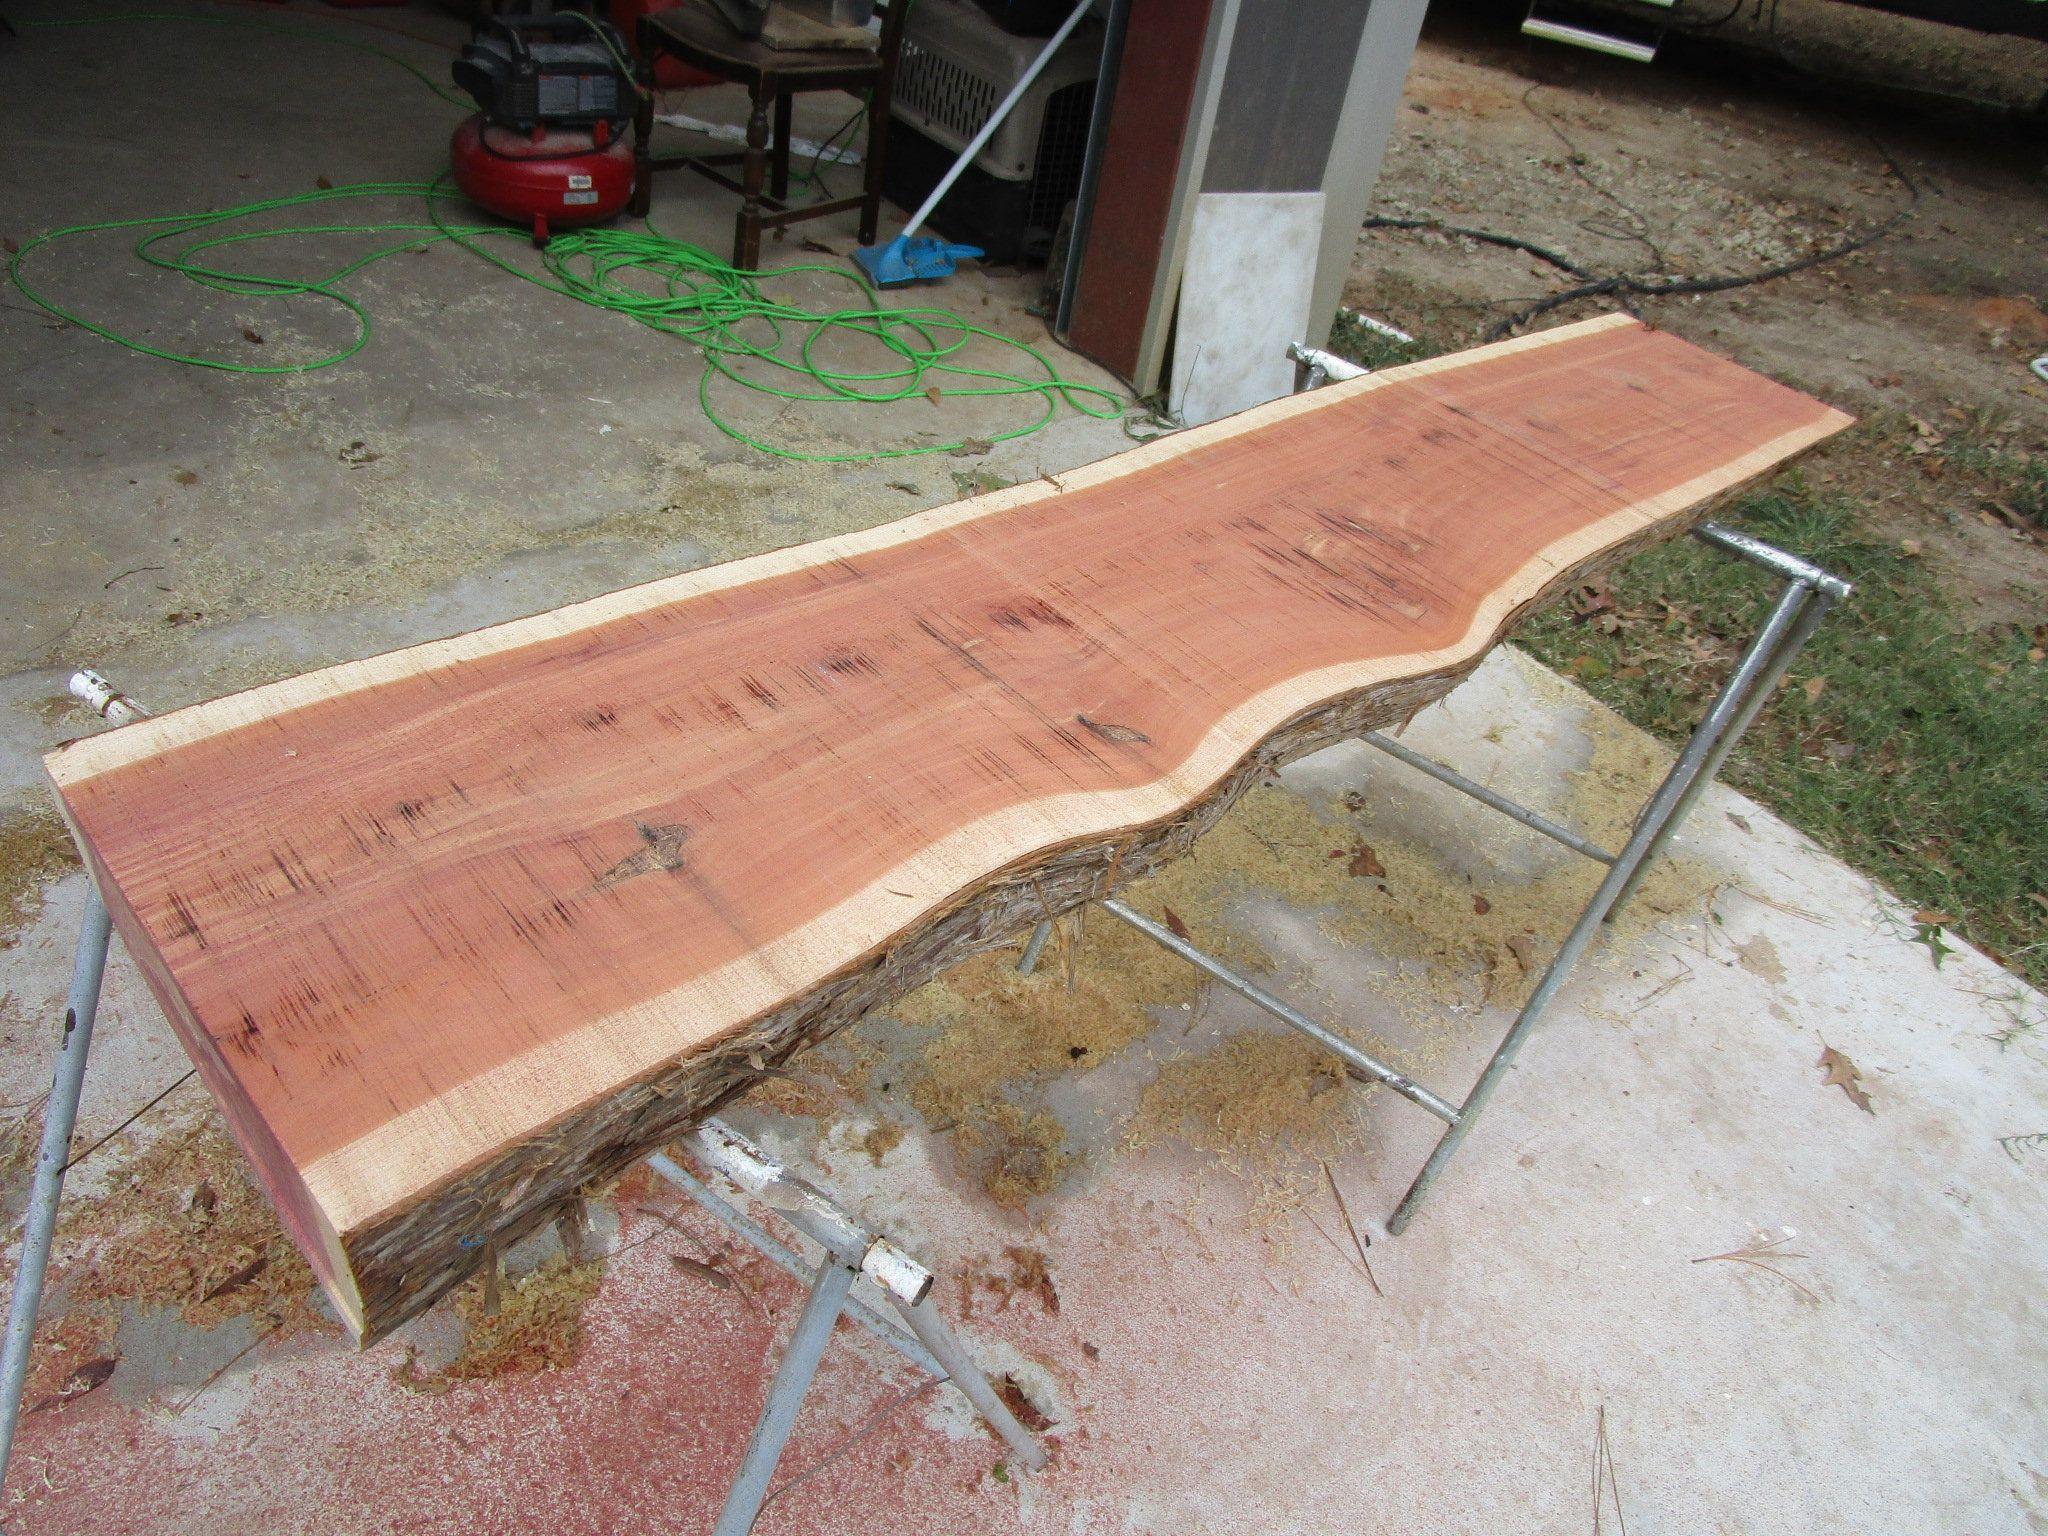 3 Thick 63 Long Cedar Wood Fireplace Mantel Slab Woodworking Project 12 14 Wide Wood Fireplace Mantel Wood Fireplace Fireplace Mantels